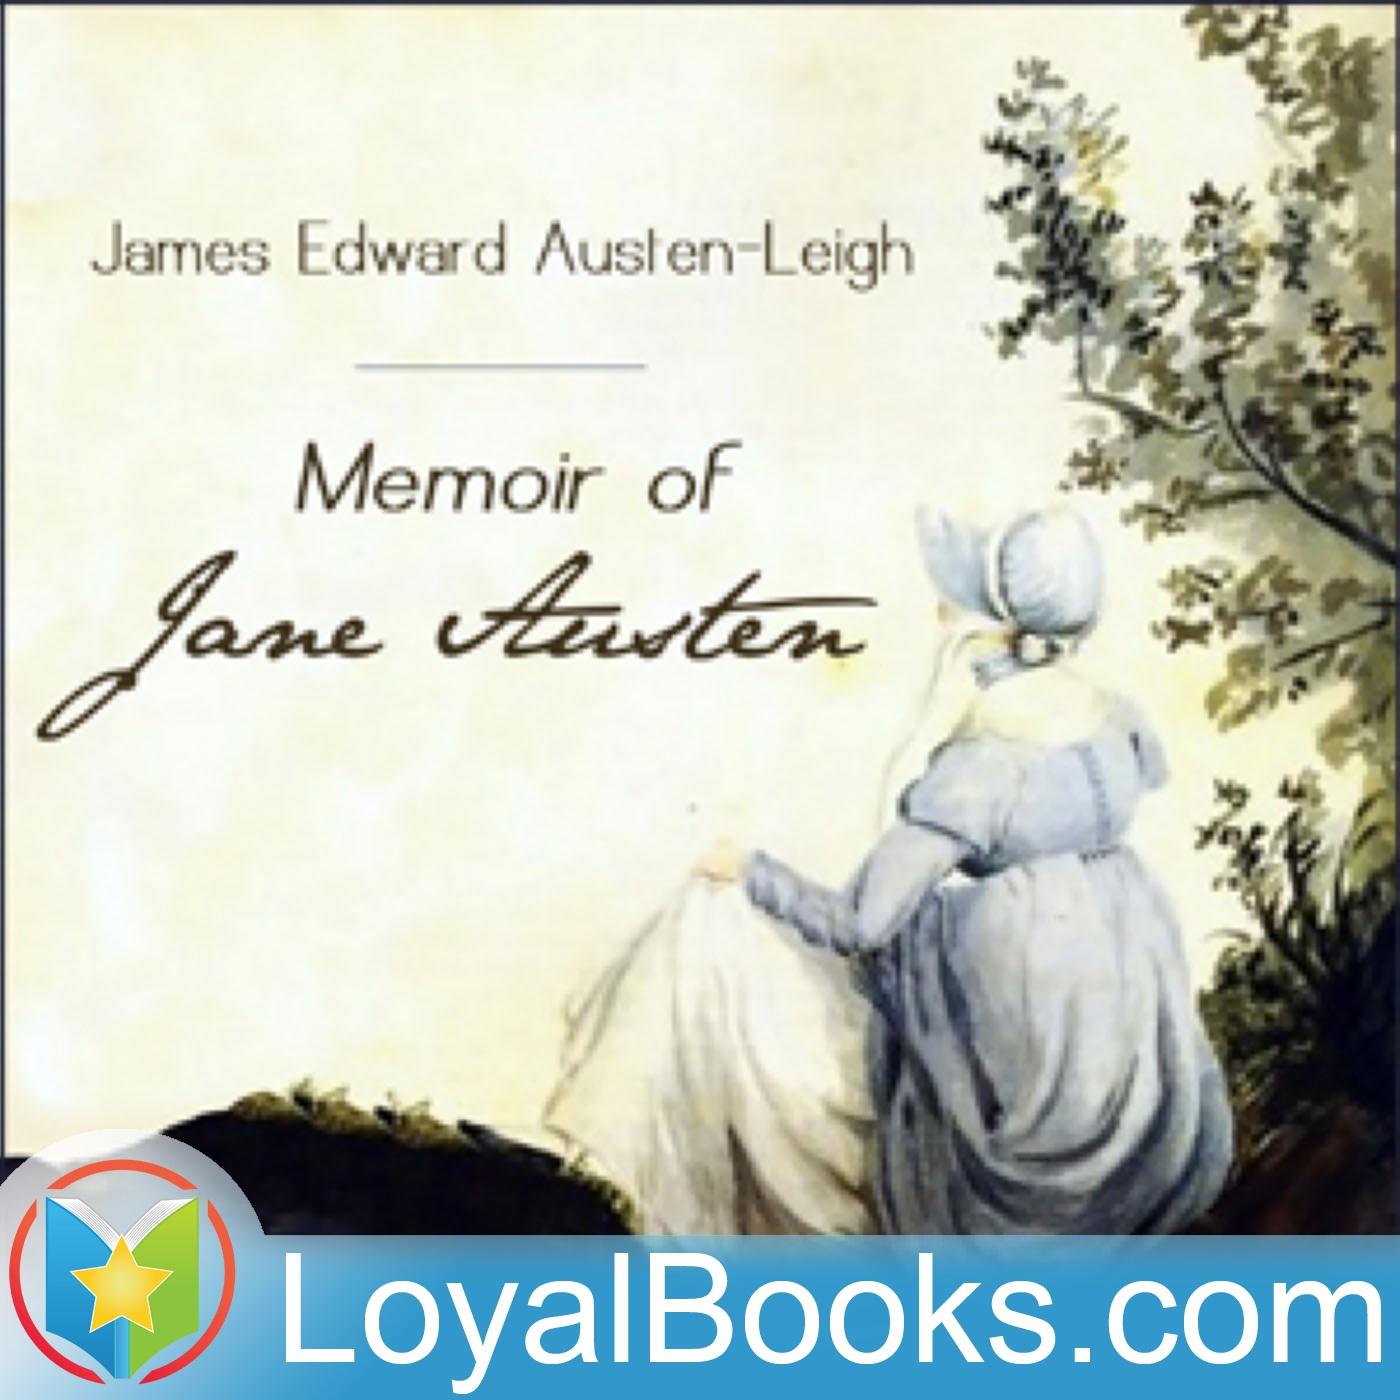 Memoir of Jane Austen by James Edward Austen-Leigh  